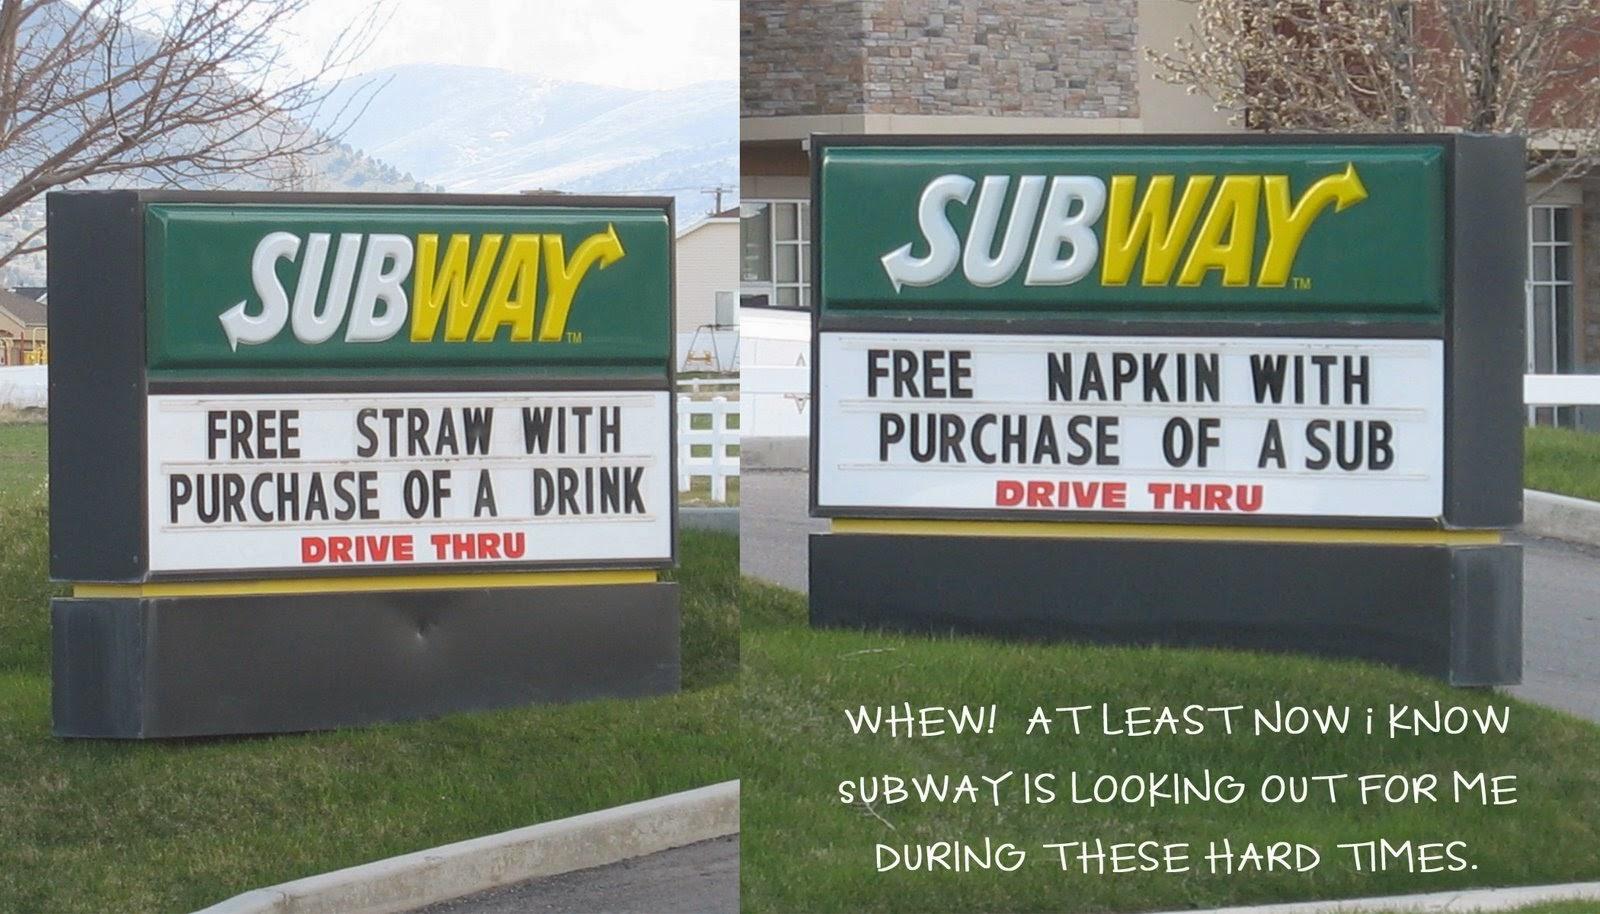 [subwaysignpluscomments.jpg]